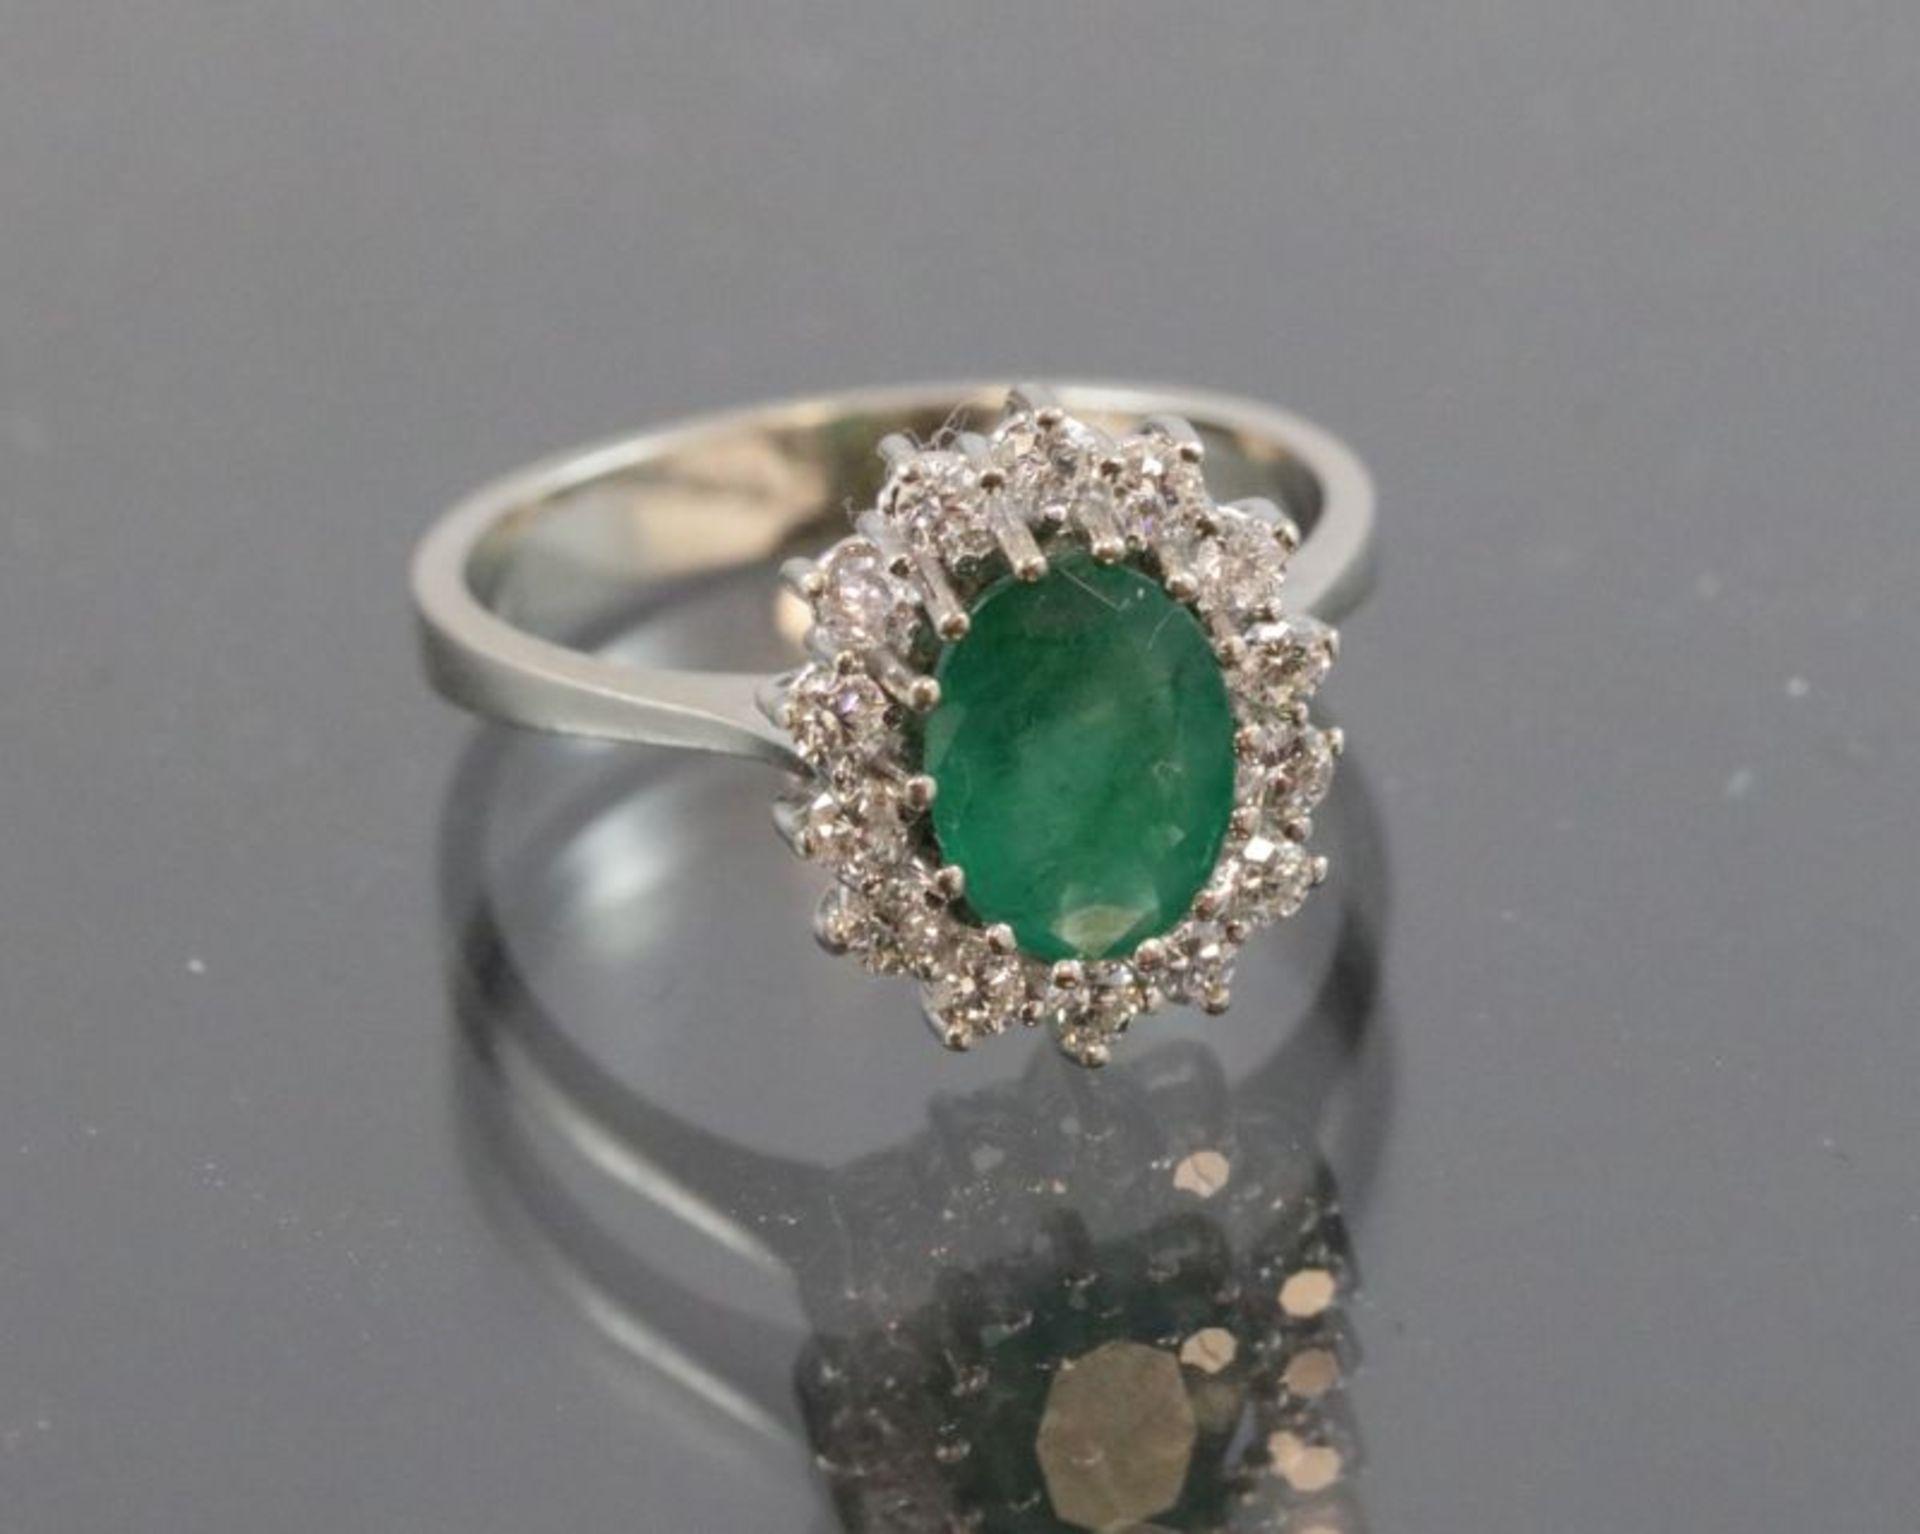 Los 50 - Smaragd-Brillant-Ring, 585 Weißgold3,5 Gramm 14 Brillanten, 0,36 ct., Ringgröße: 53Smaragd ca. 1